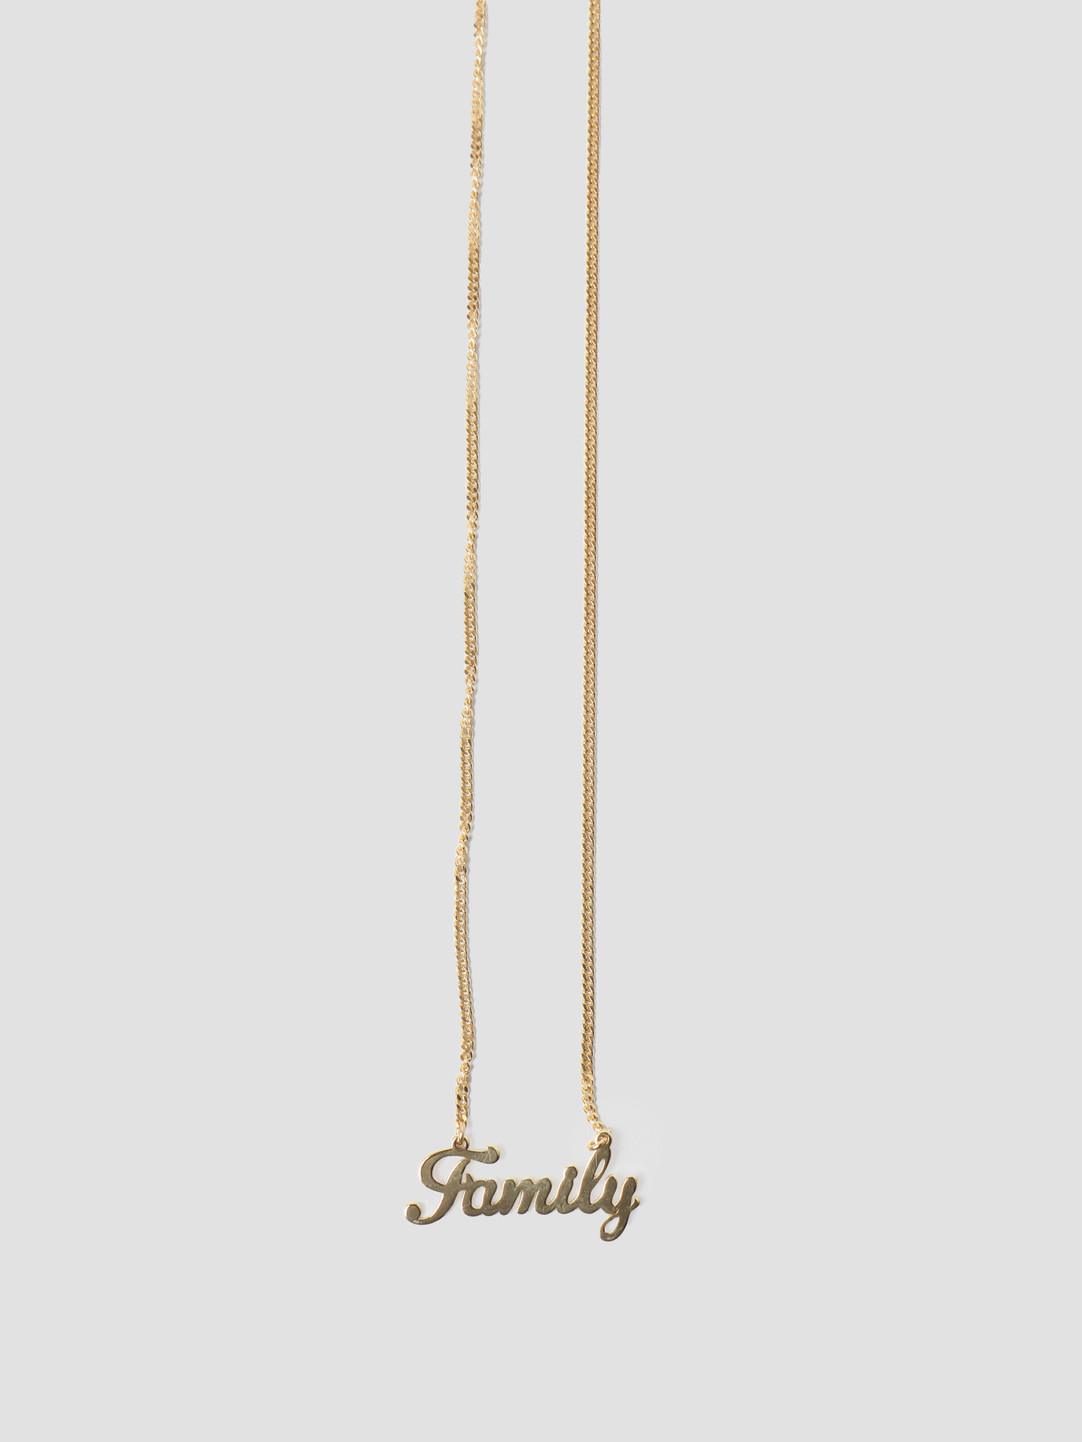 Golia Golia by Freshcotton Family Necklace 55cm 14K Gold Plated